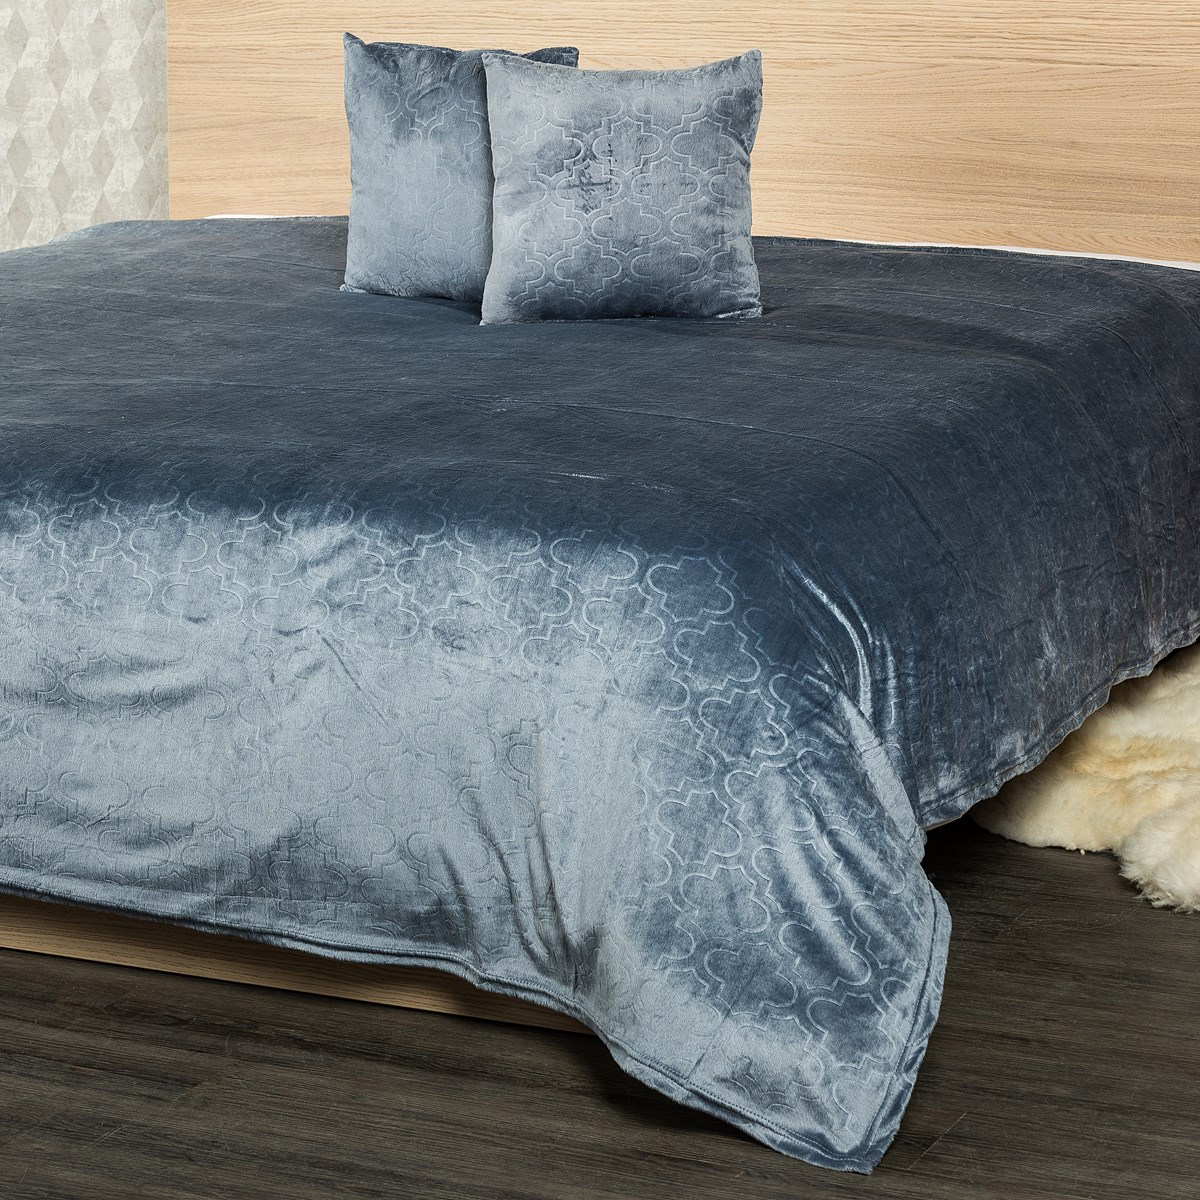 4home gytakar salazar sz rke k k 220 x 240 cm 2x 40 x 40 cm lakberendez s. Black Bedroom Furniture Sets. Home Design Ideas